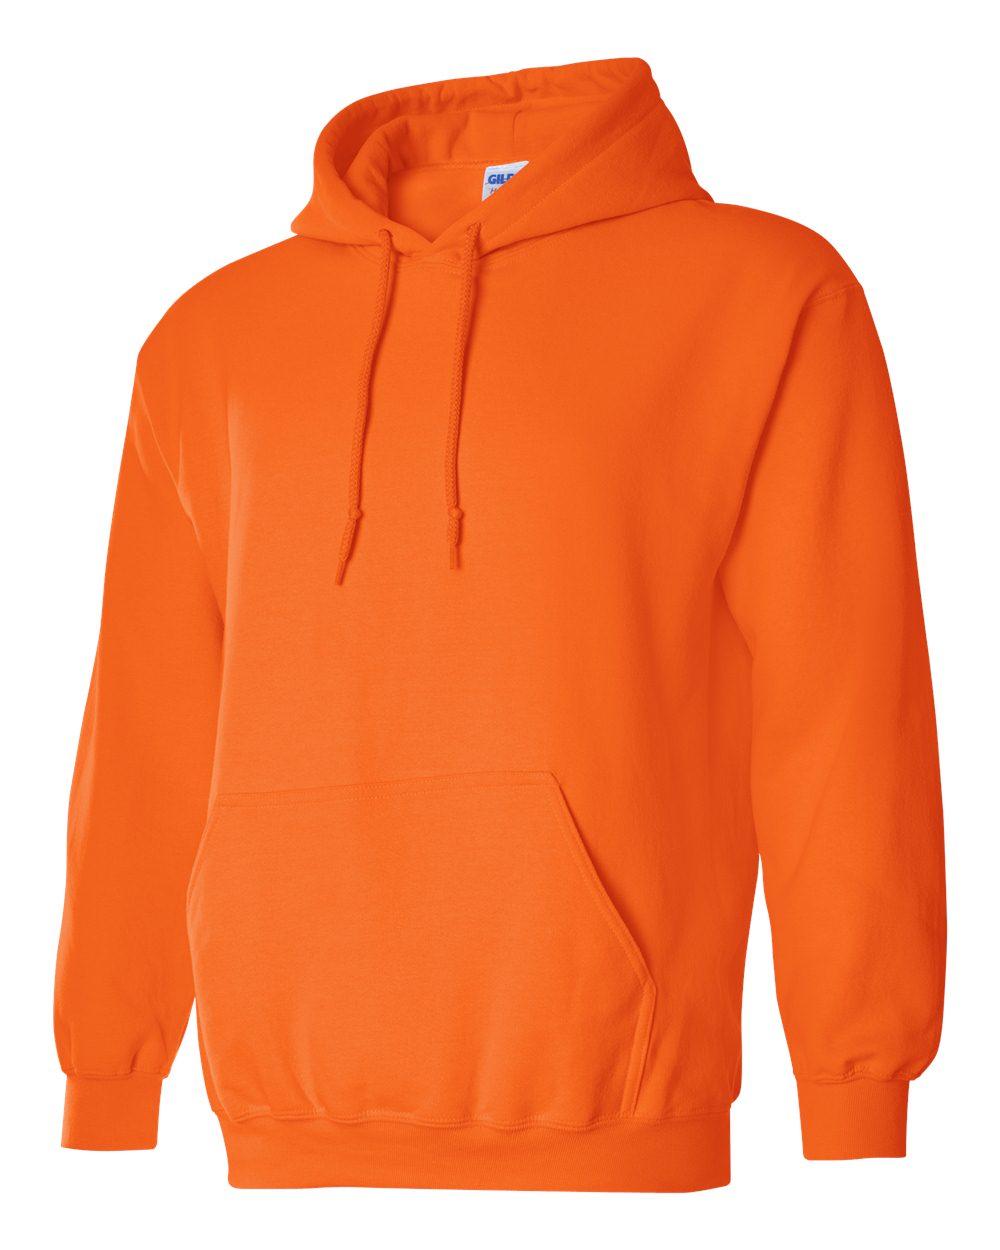 GI18500 Safety Orange